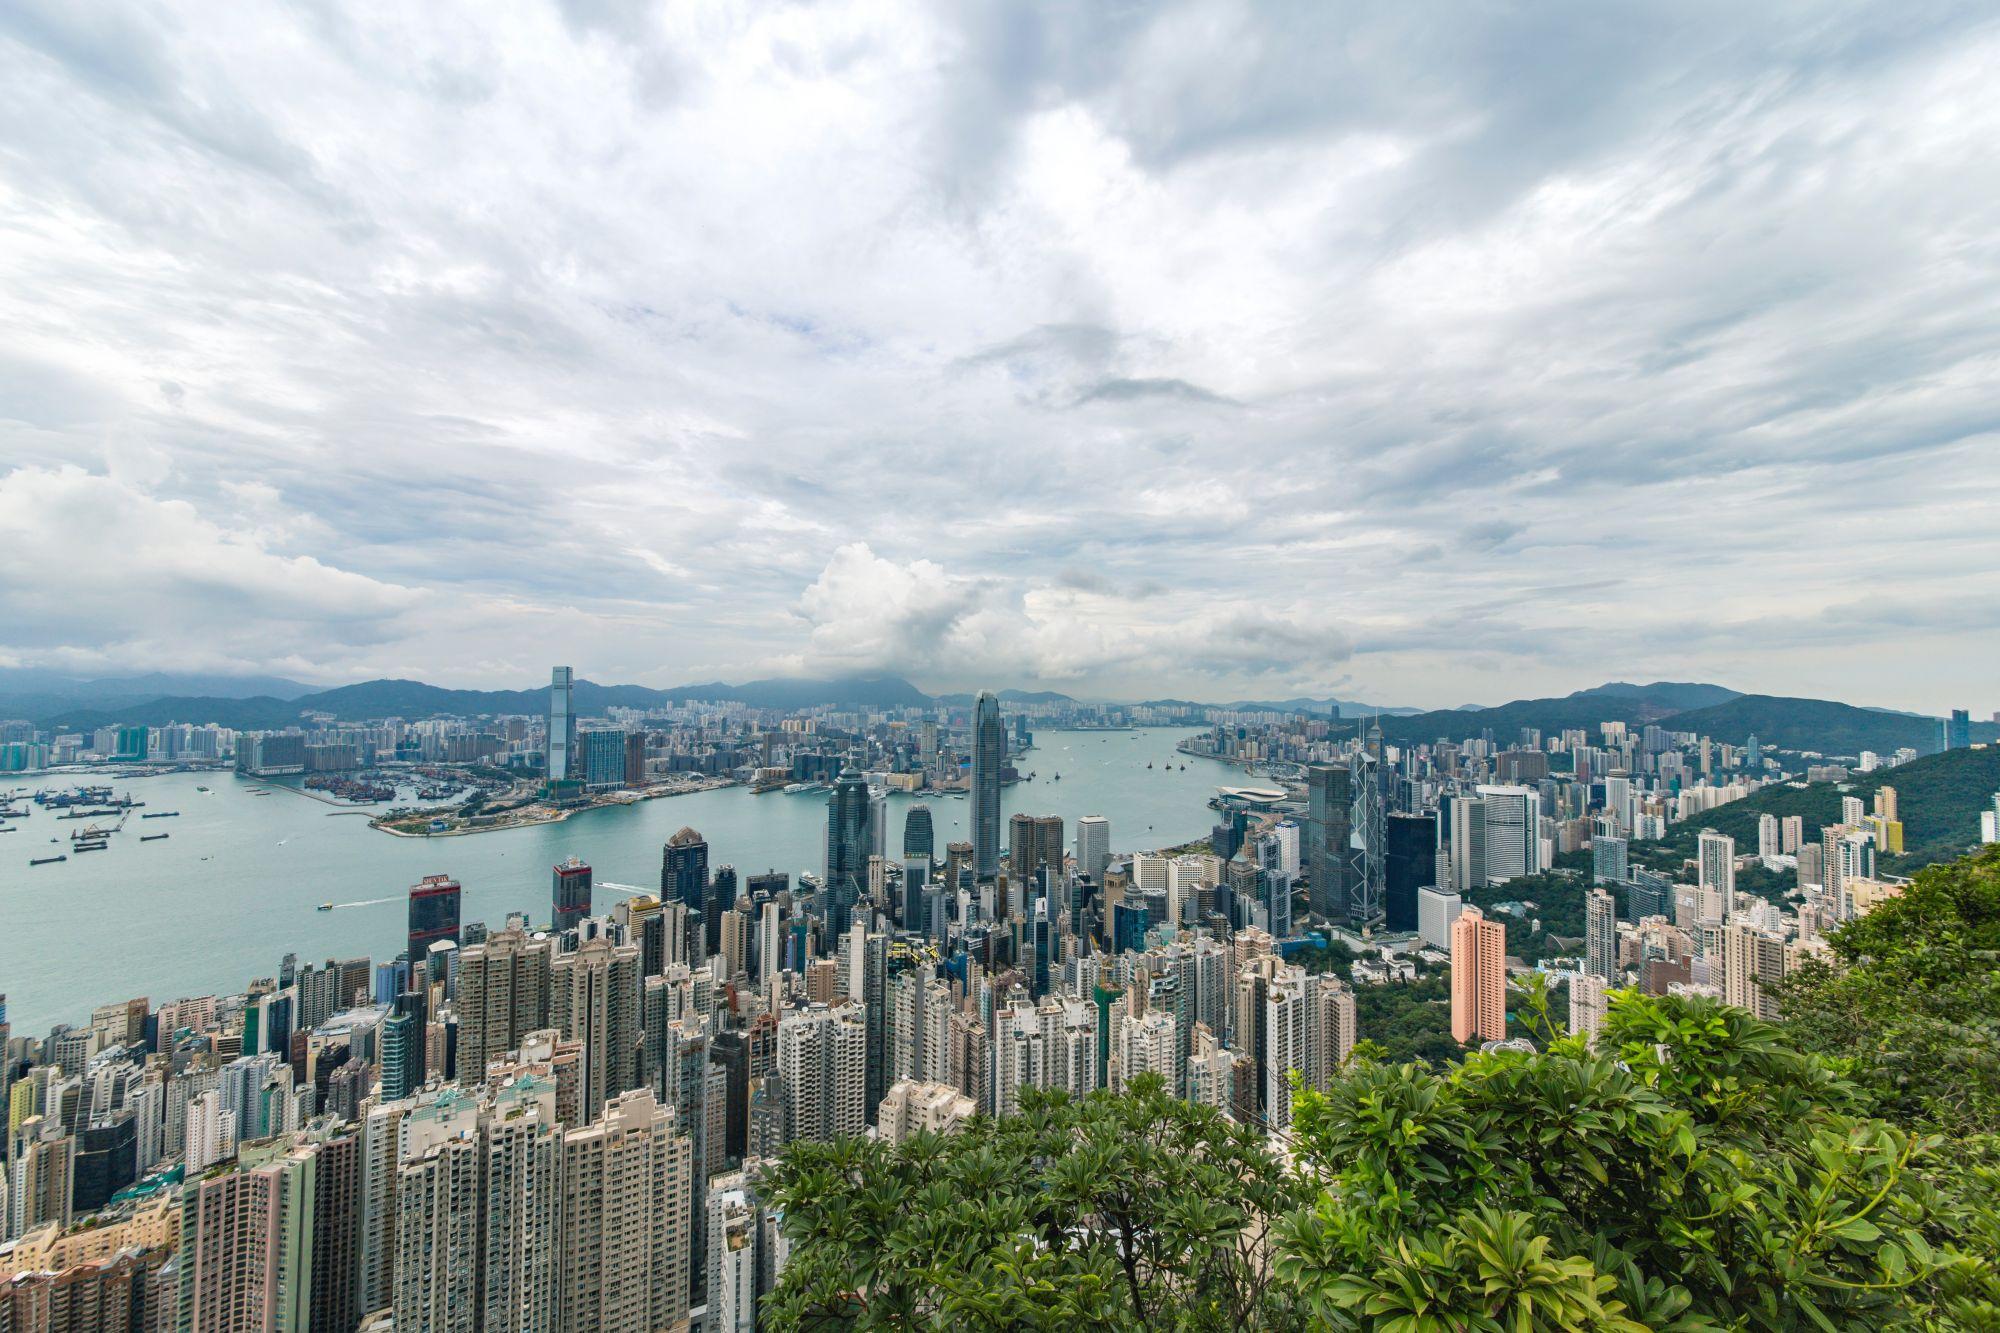 Peter Cheung Shares 5 Ways To Embrace Summer In Hong Kong